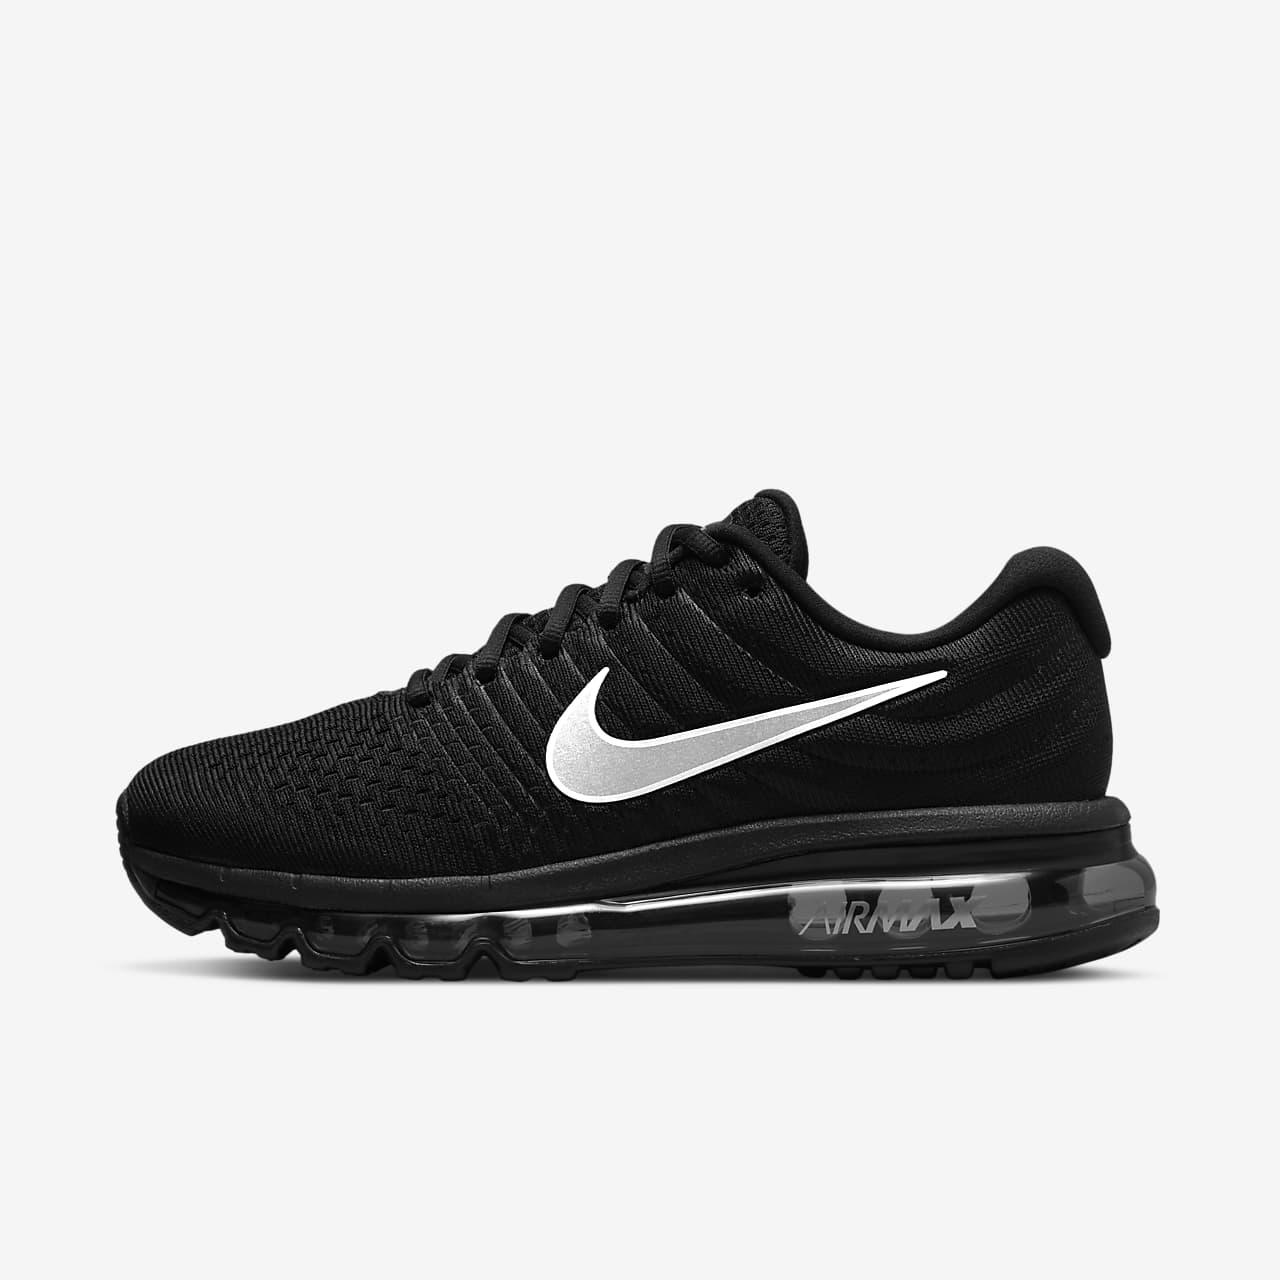 size 40 08d4c 91a02 ... Γυναικείο παπούτσι Nike Air Max 2017